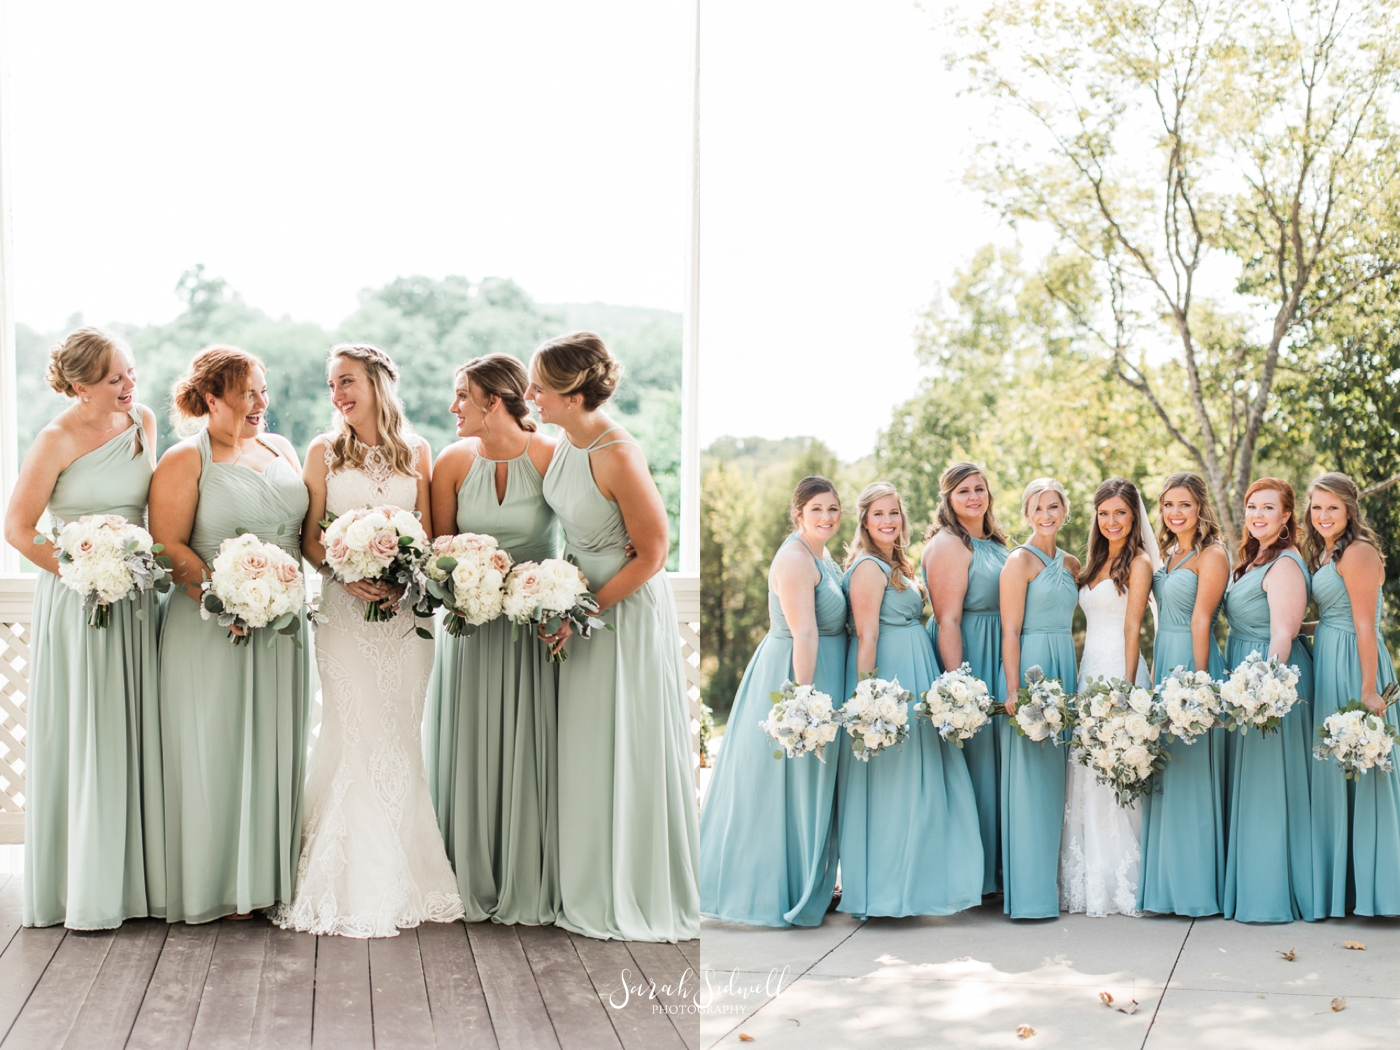 Best of Wedding Photography 2018